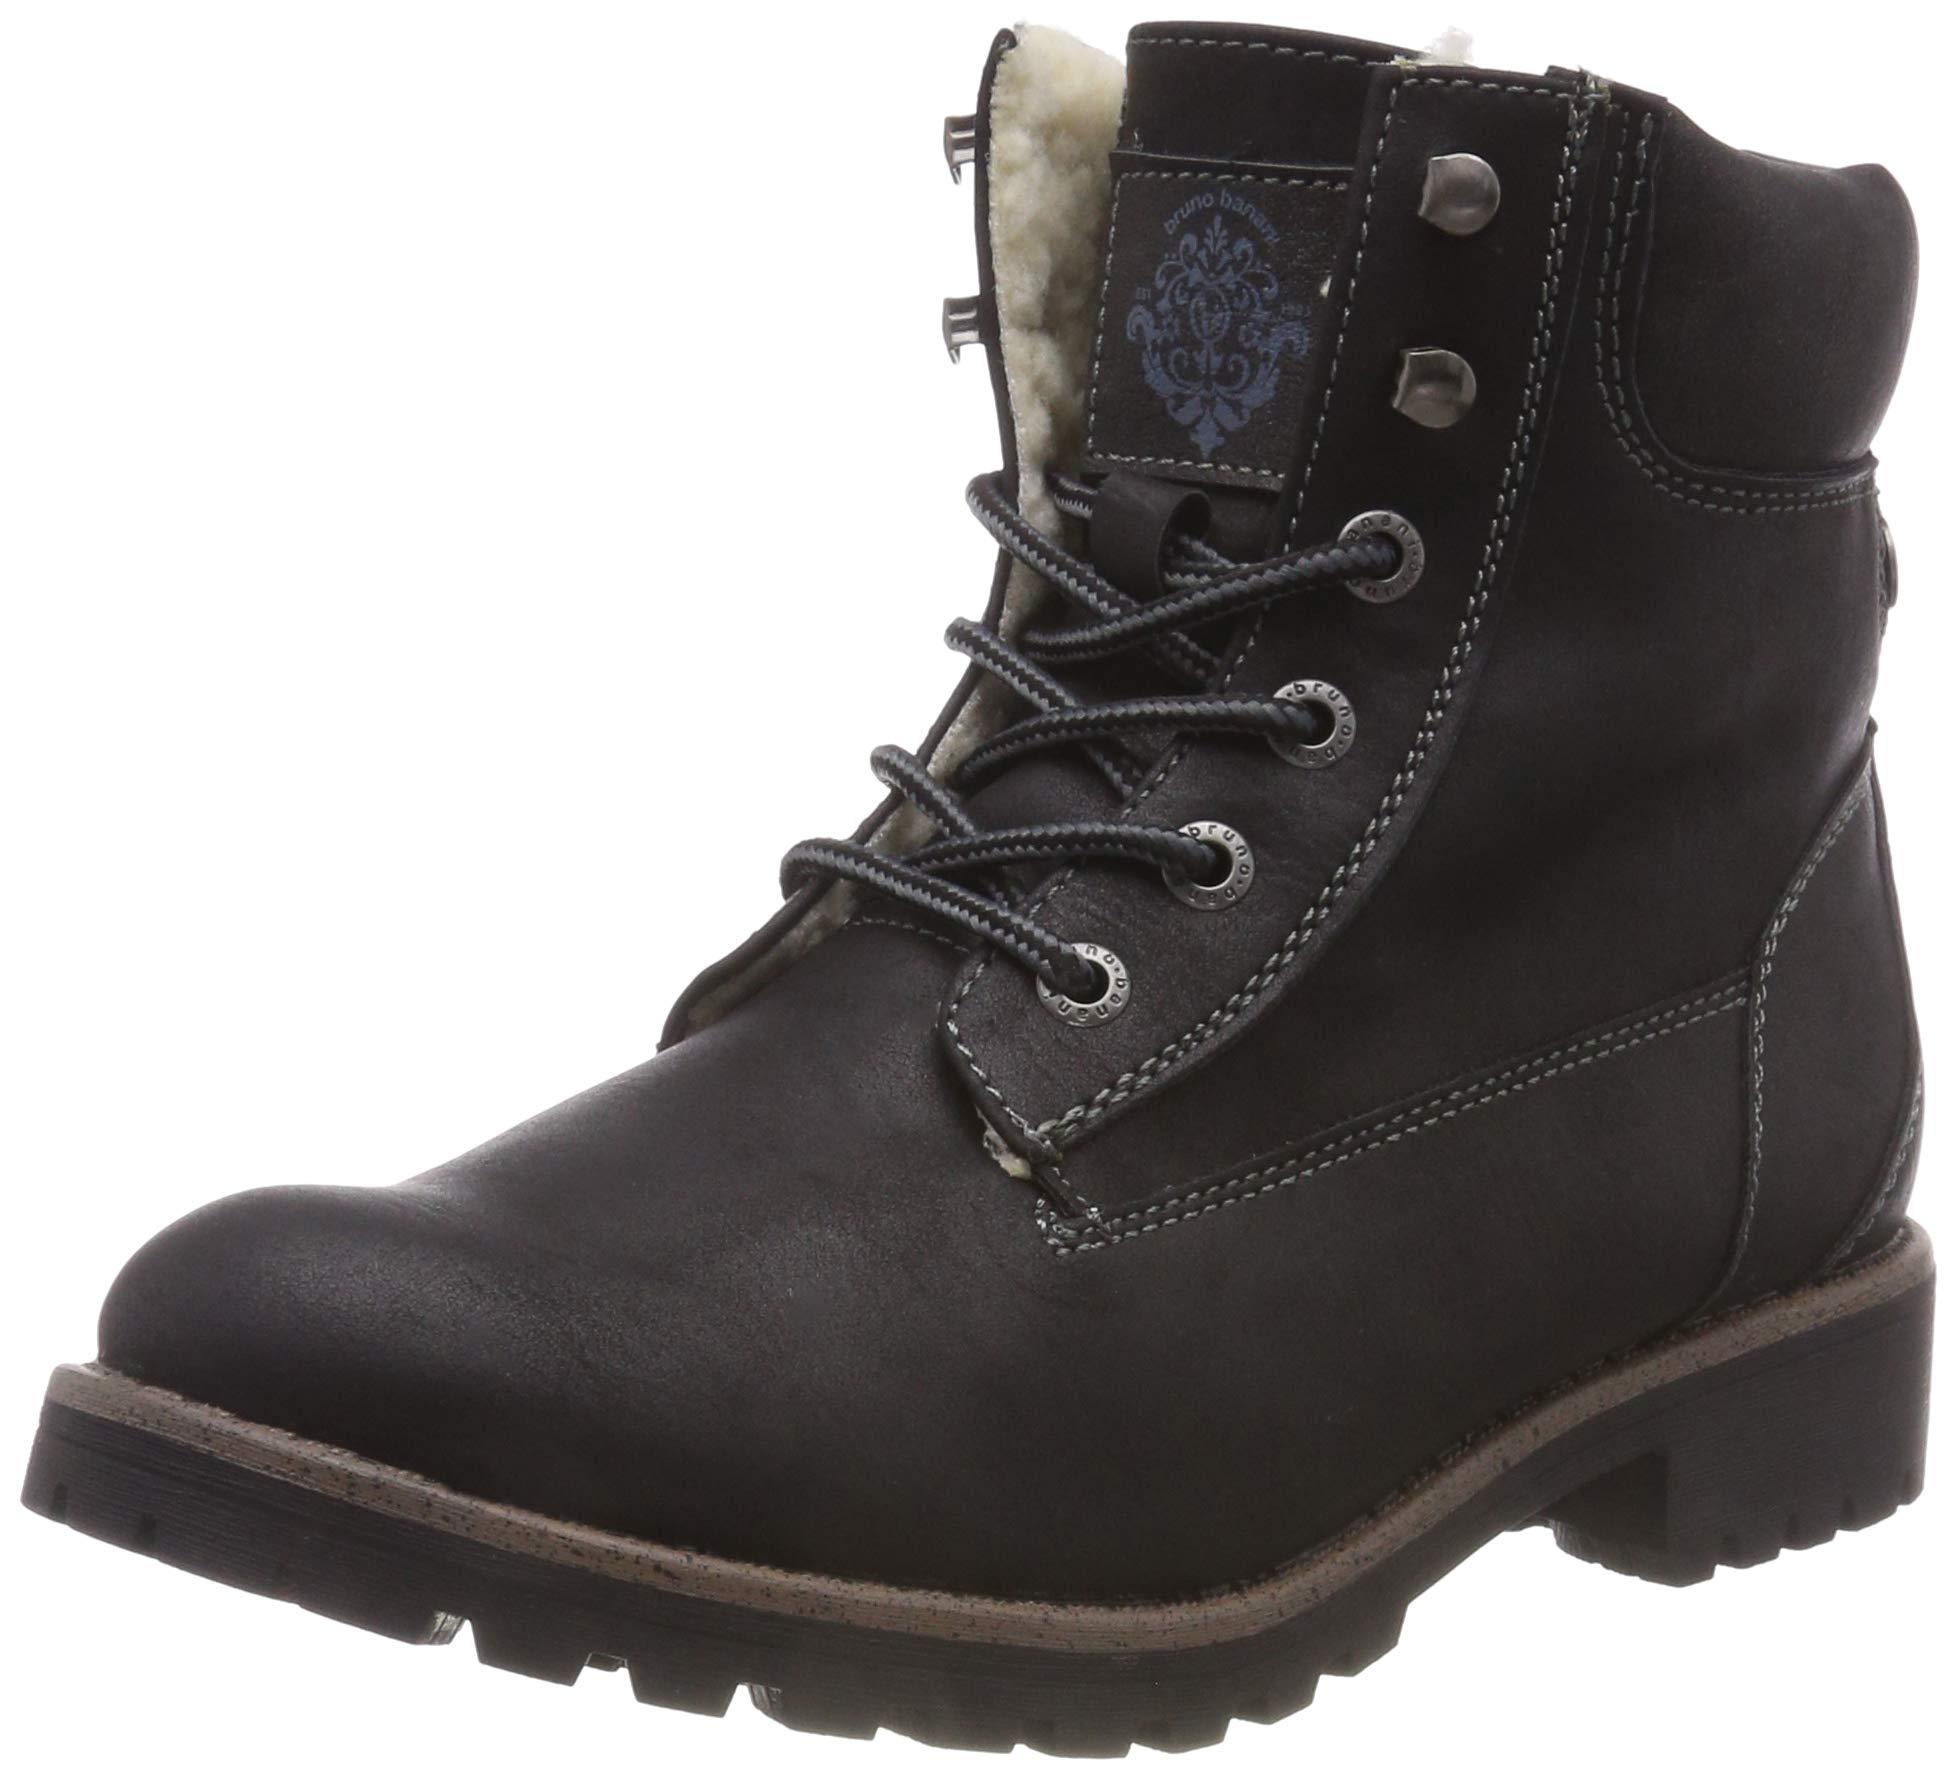 Eu 262 00437 Banani Boots Bruno FemmeNoirblack 345Rangers lK3FJcuT1